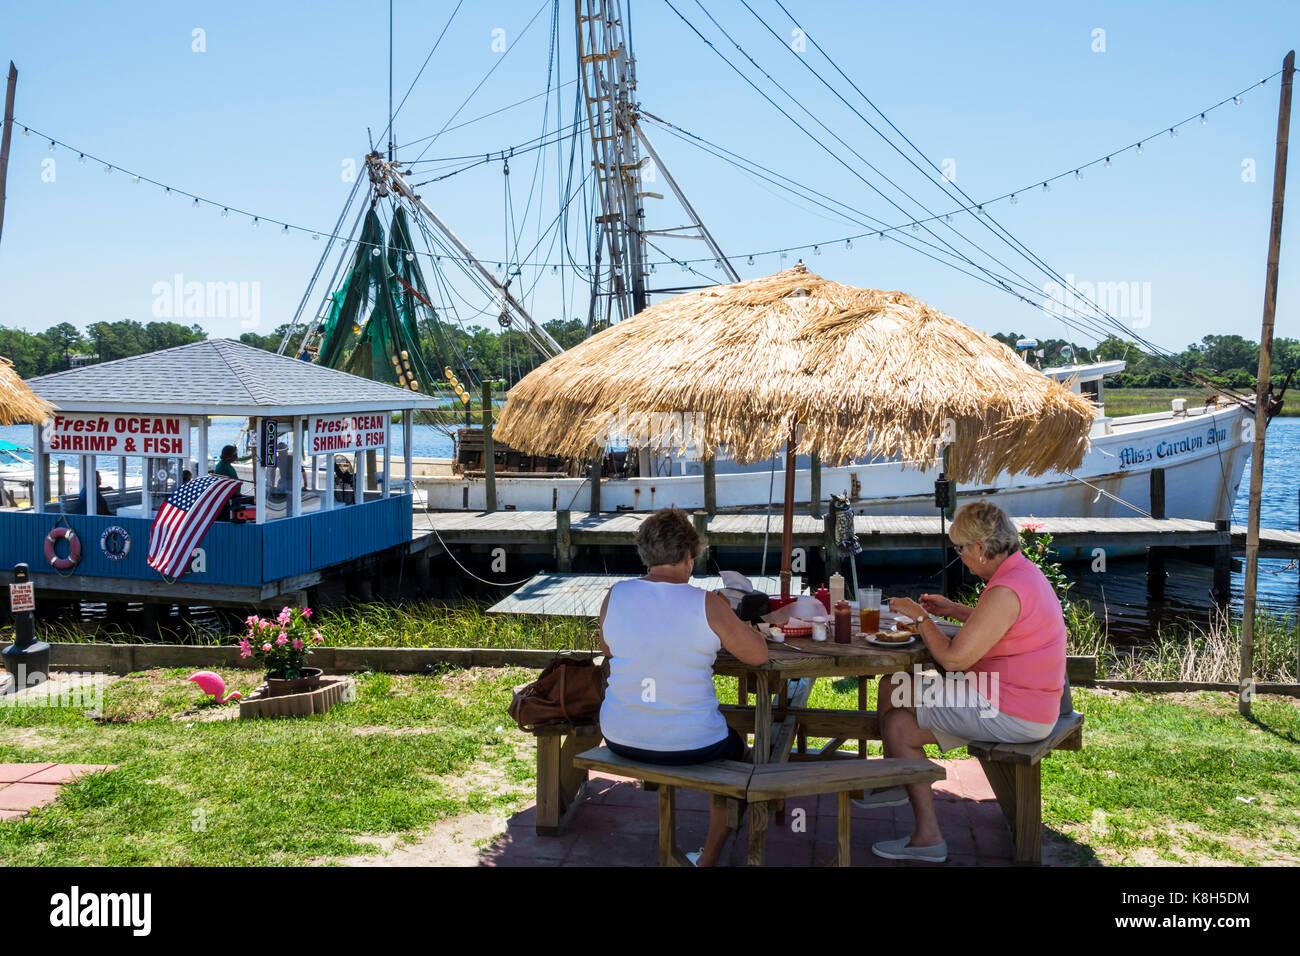 North Carolina NC Calabash fishing town seafood regional cuisine dining alfresco straw umbrella fishing boat dock - Stock Image